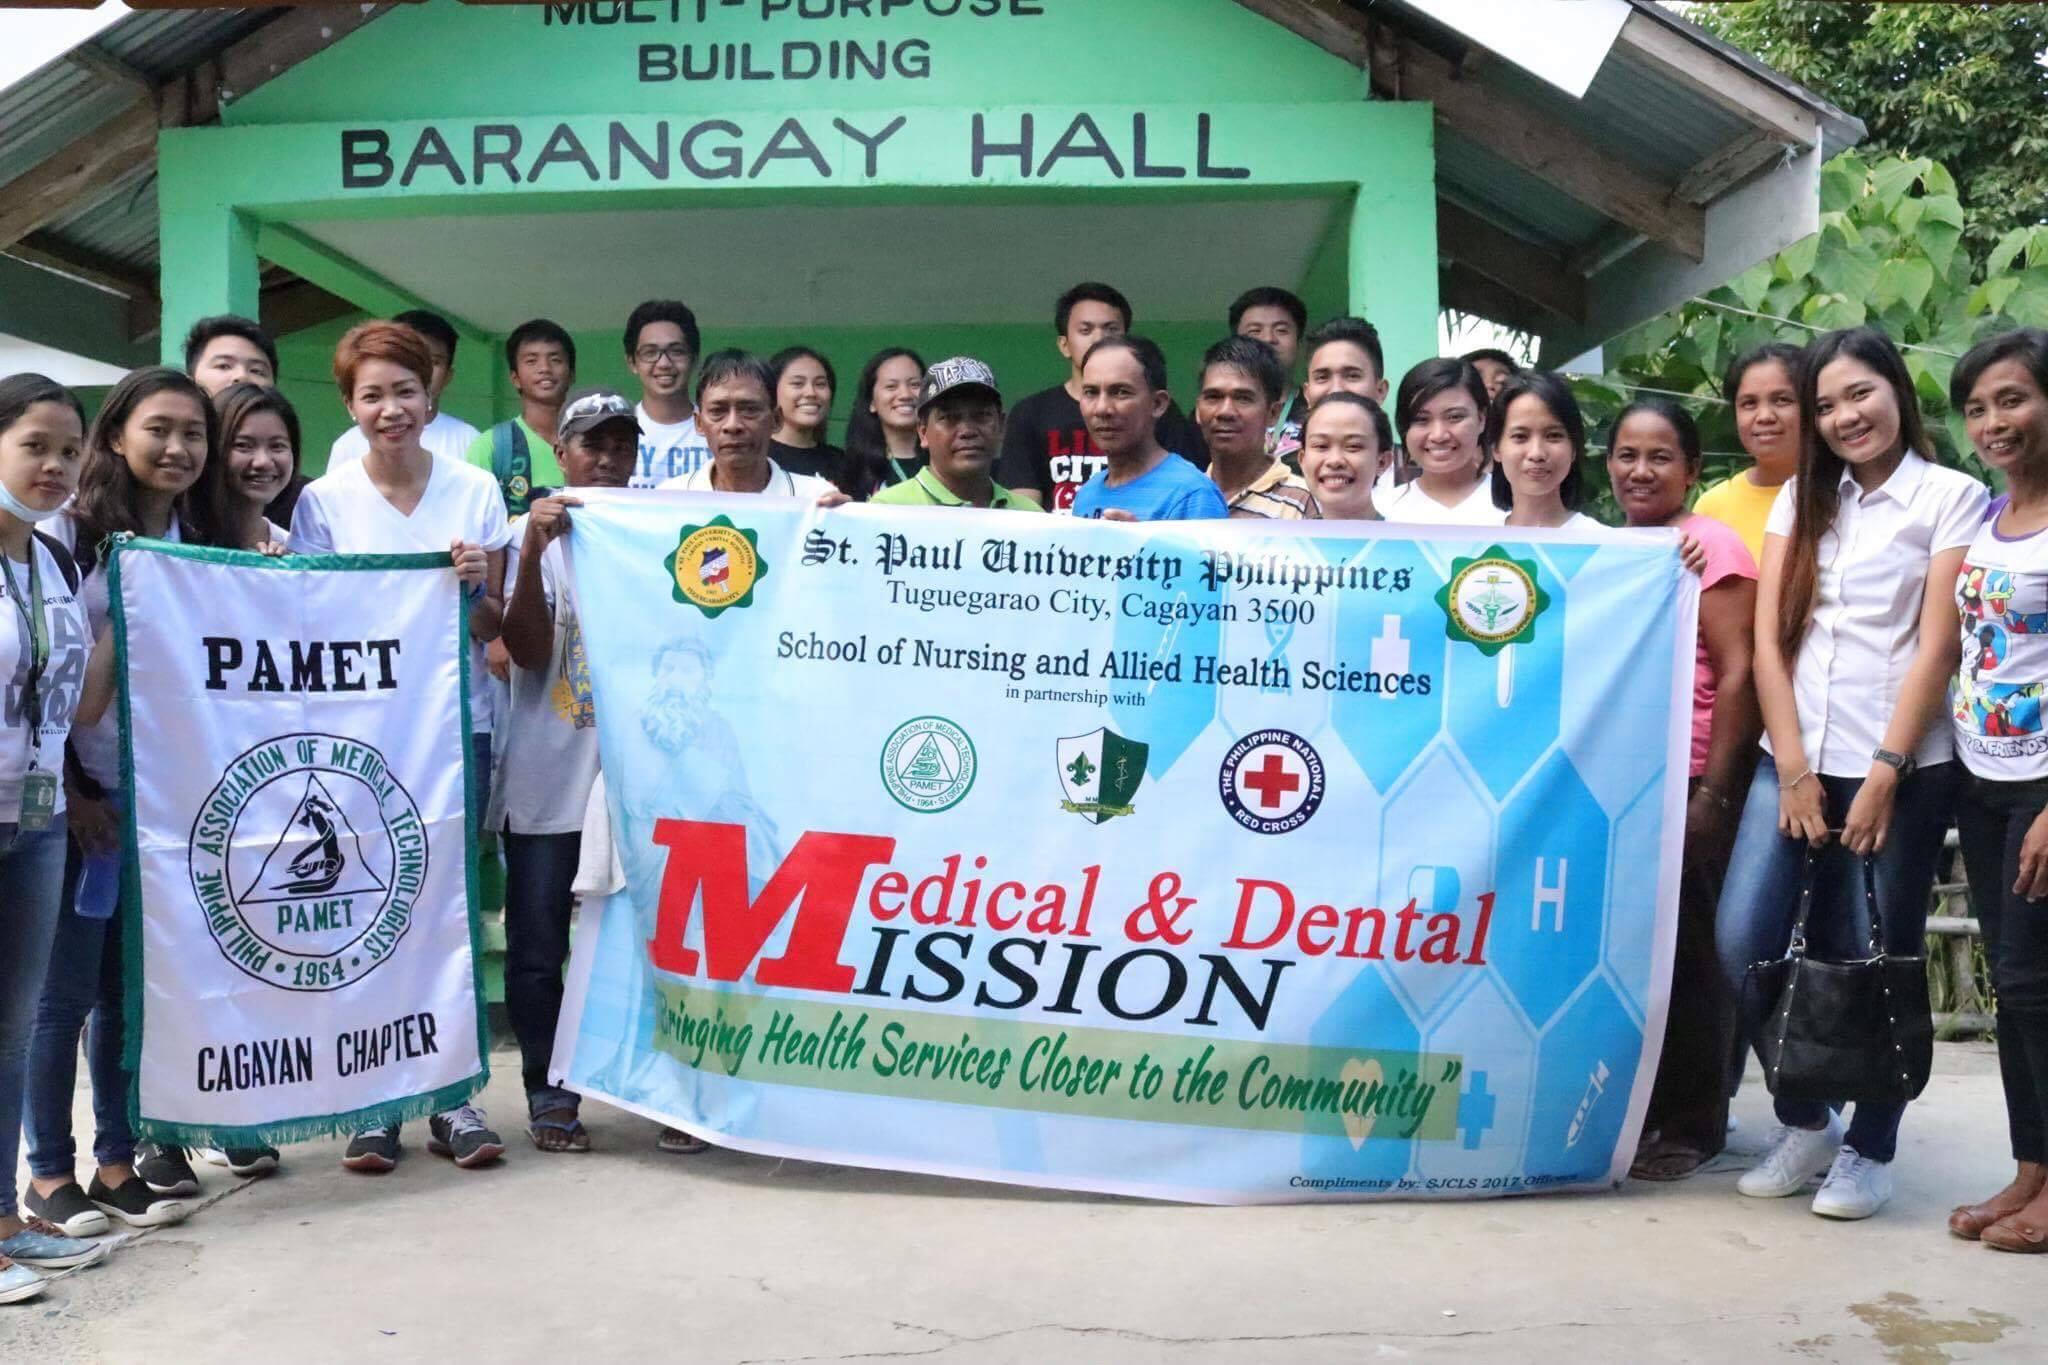 Barangay Community Record Case Study Solution & Analysis